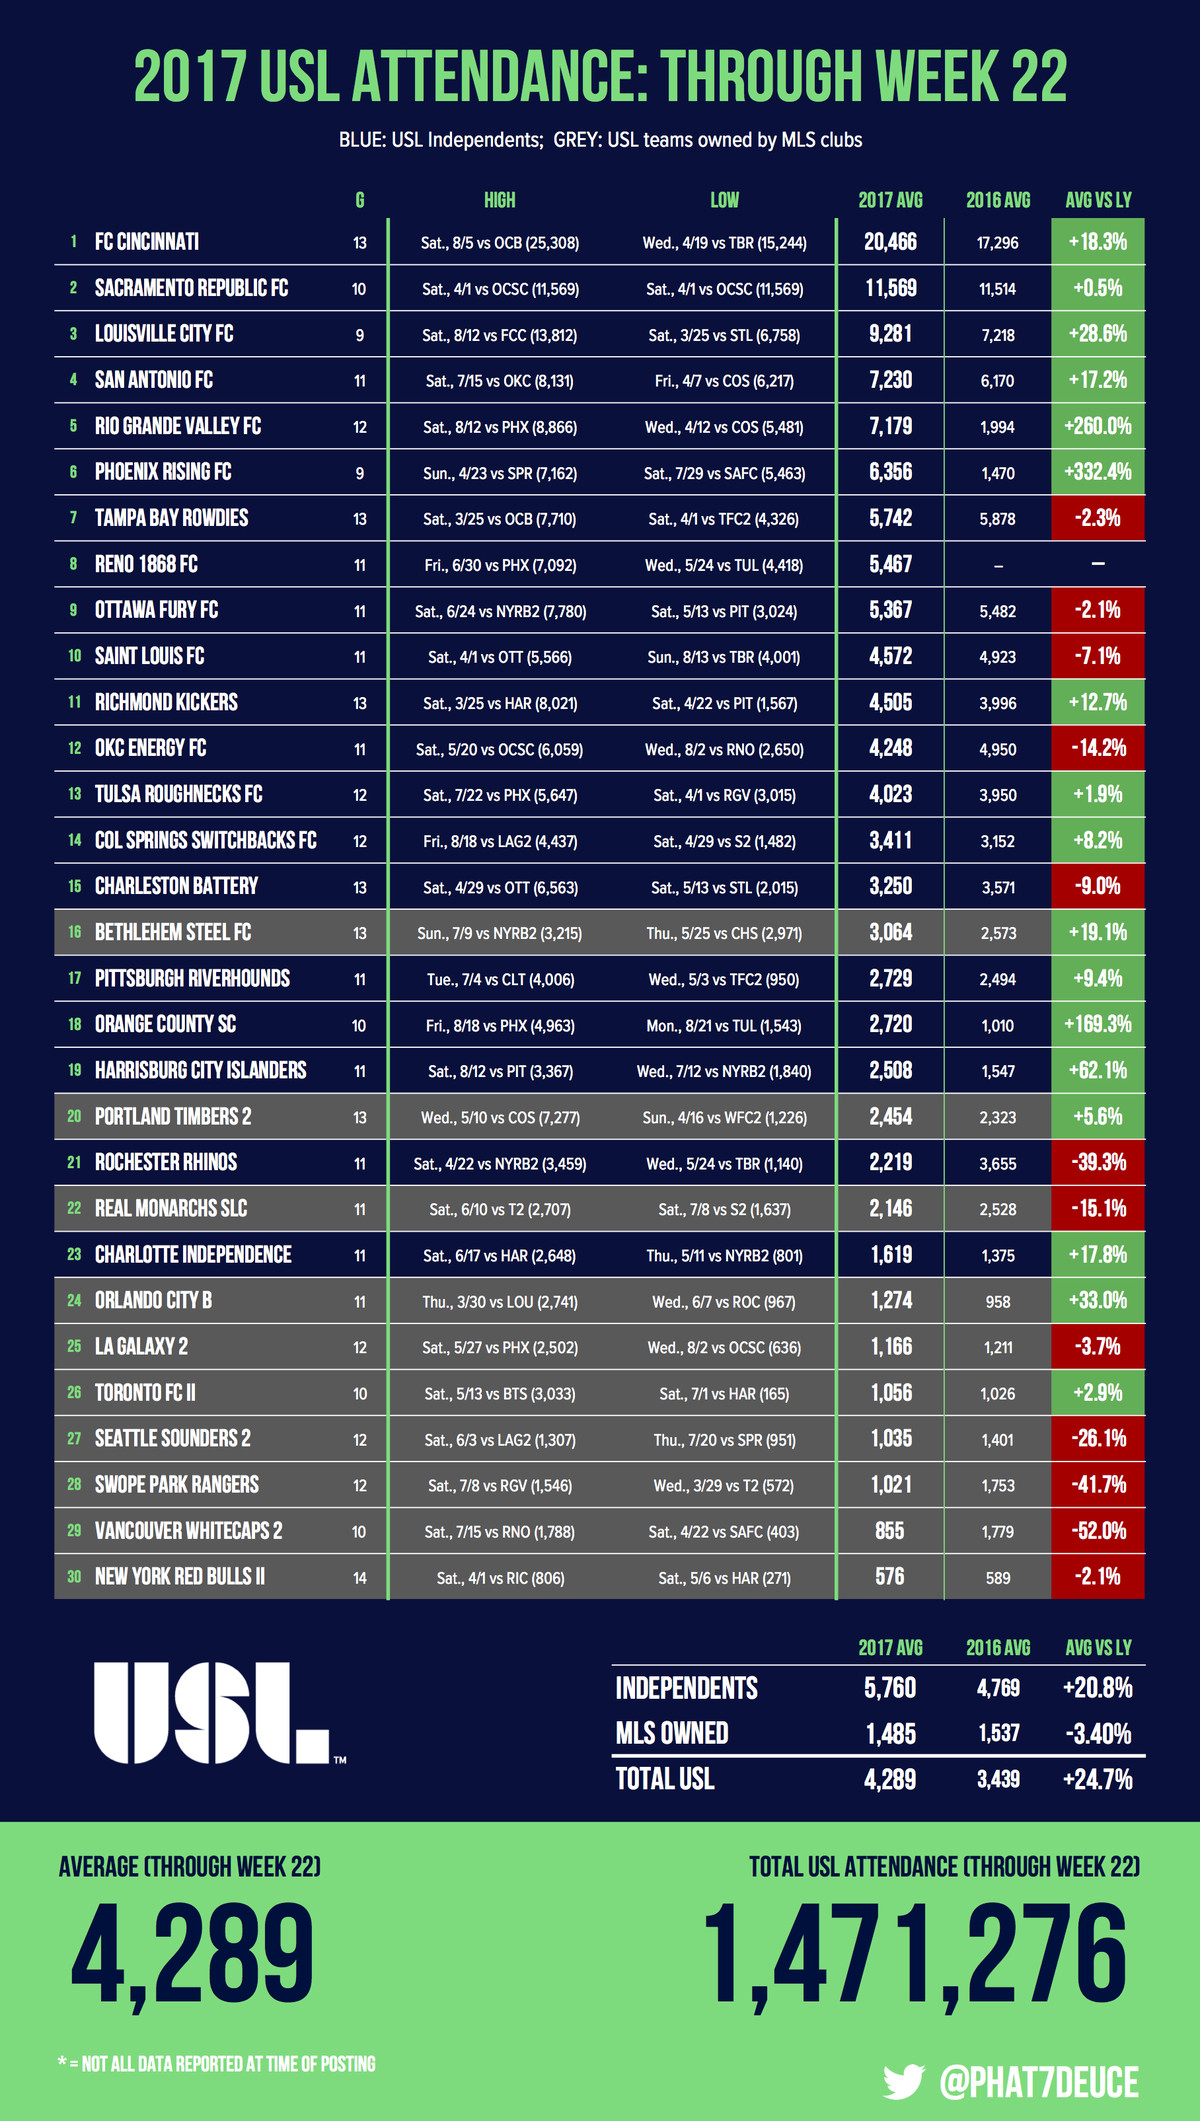 USL Total Attendance Through Week 22